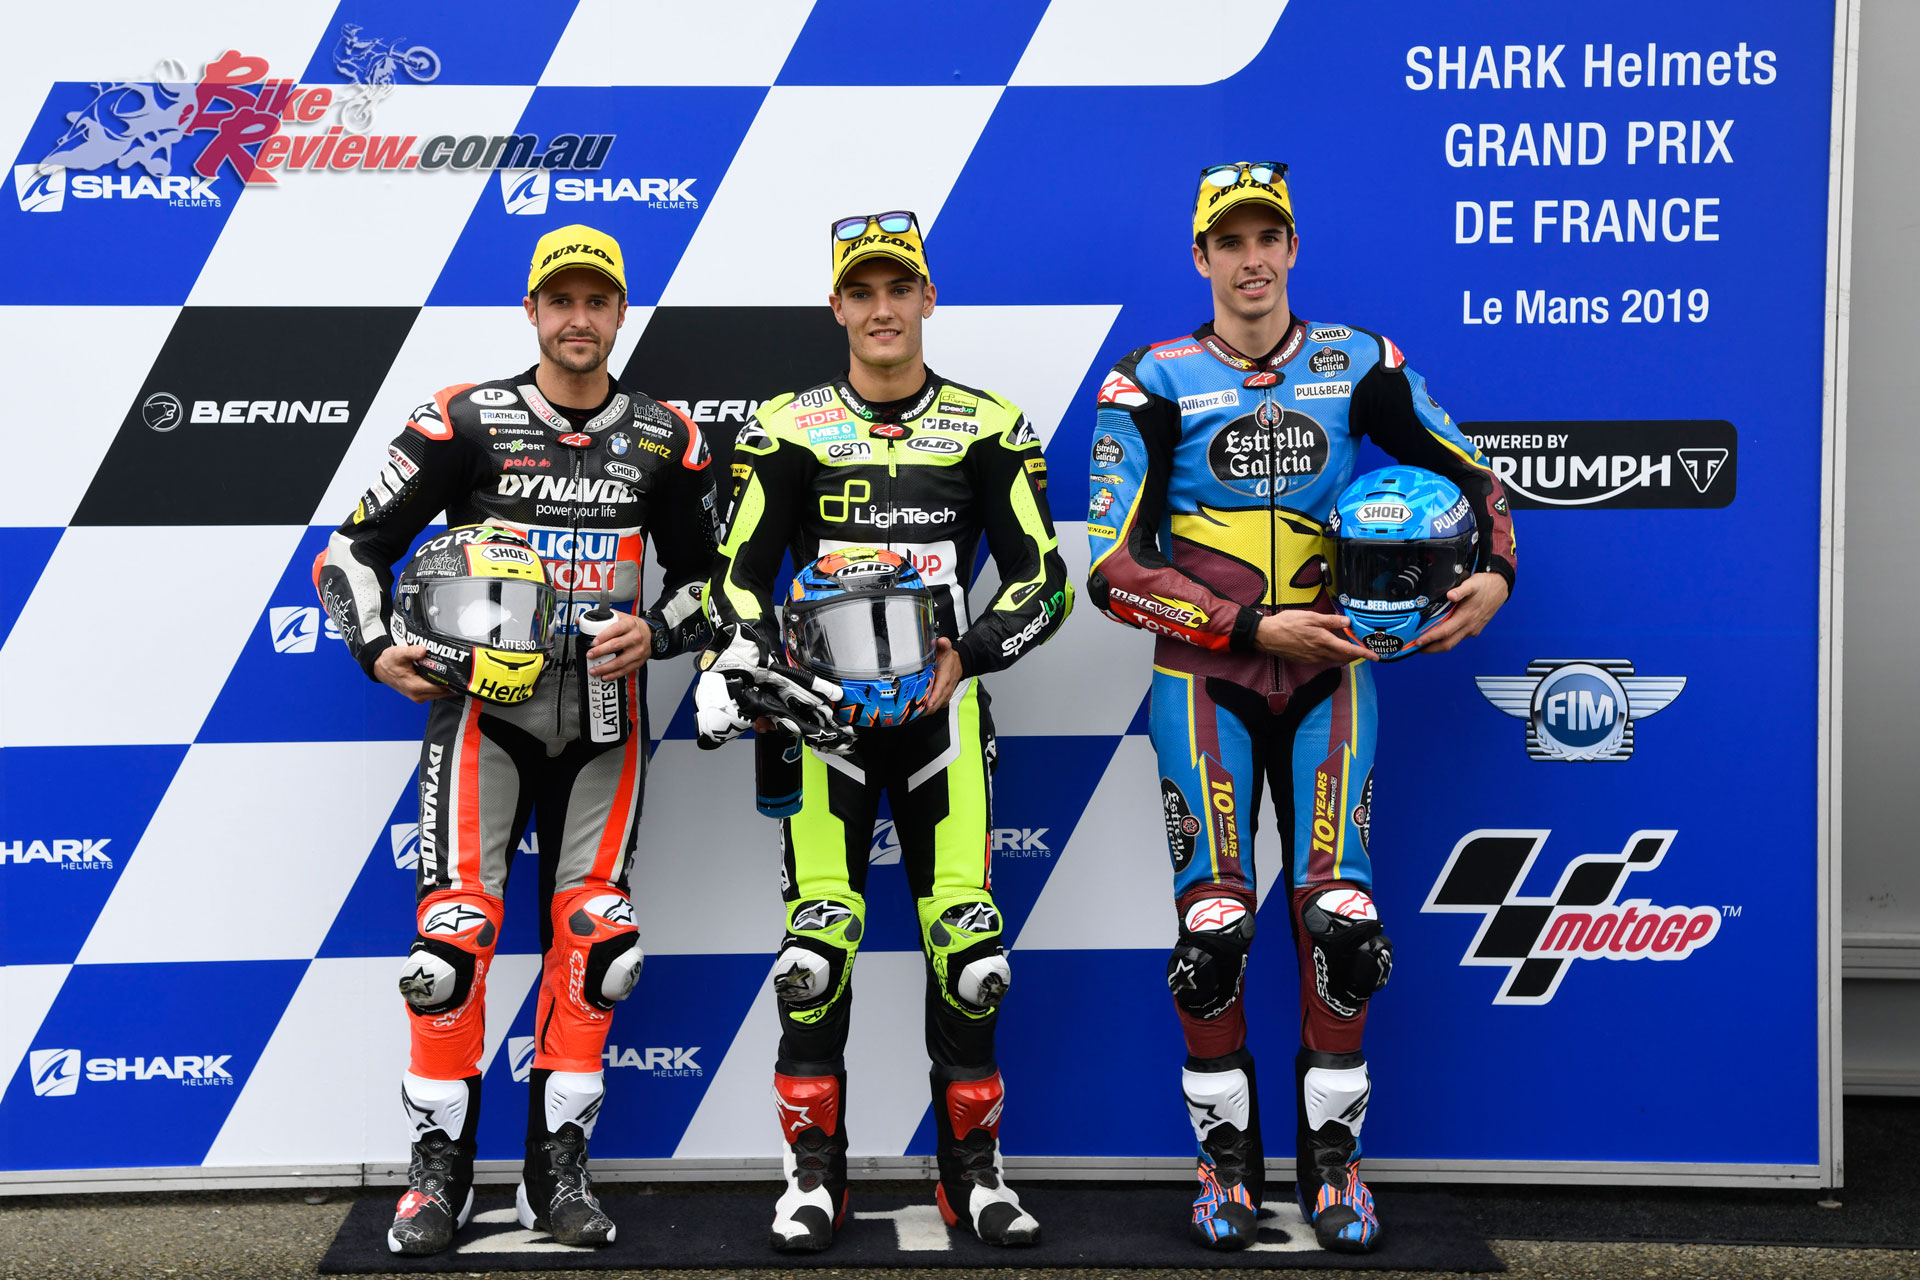 Moto2 Qualifying Top 3 - Le Mans, France, 2019